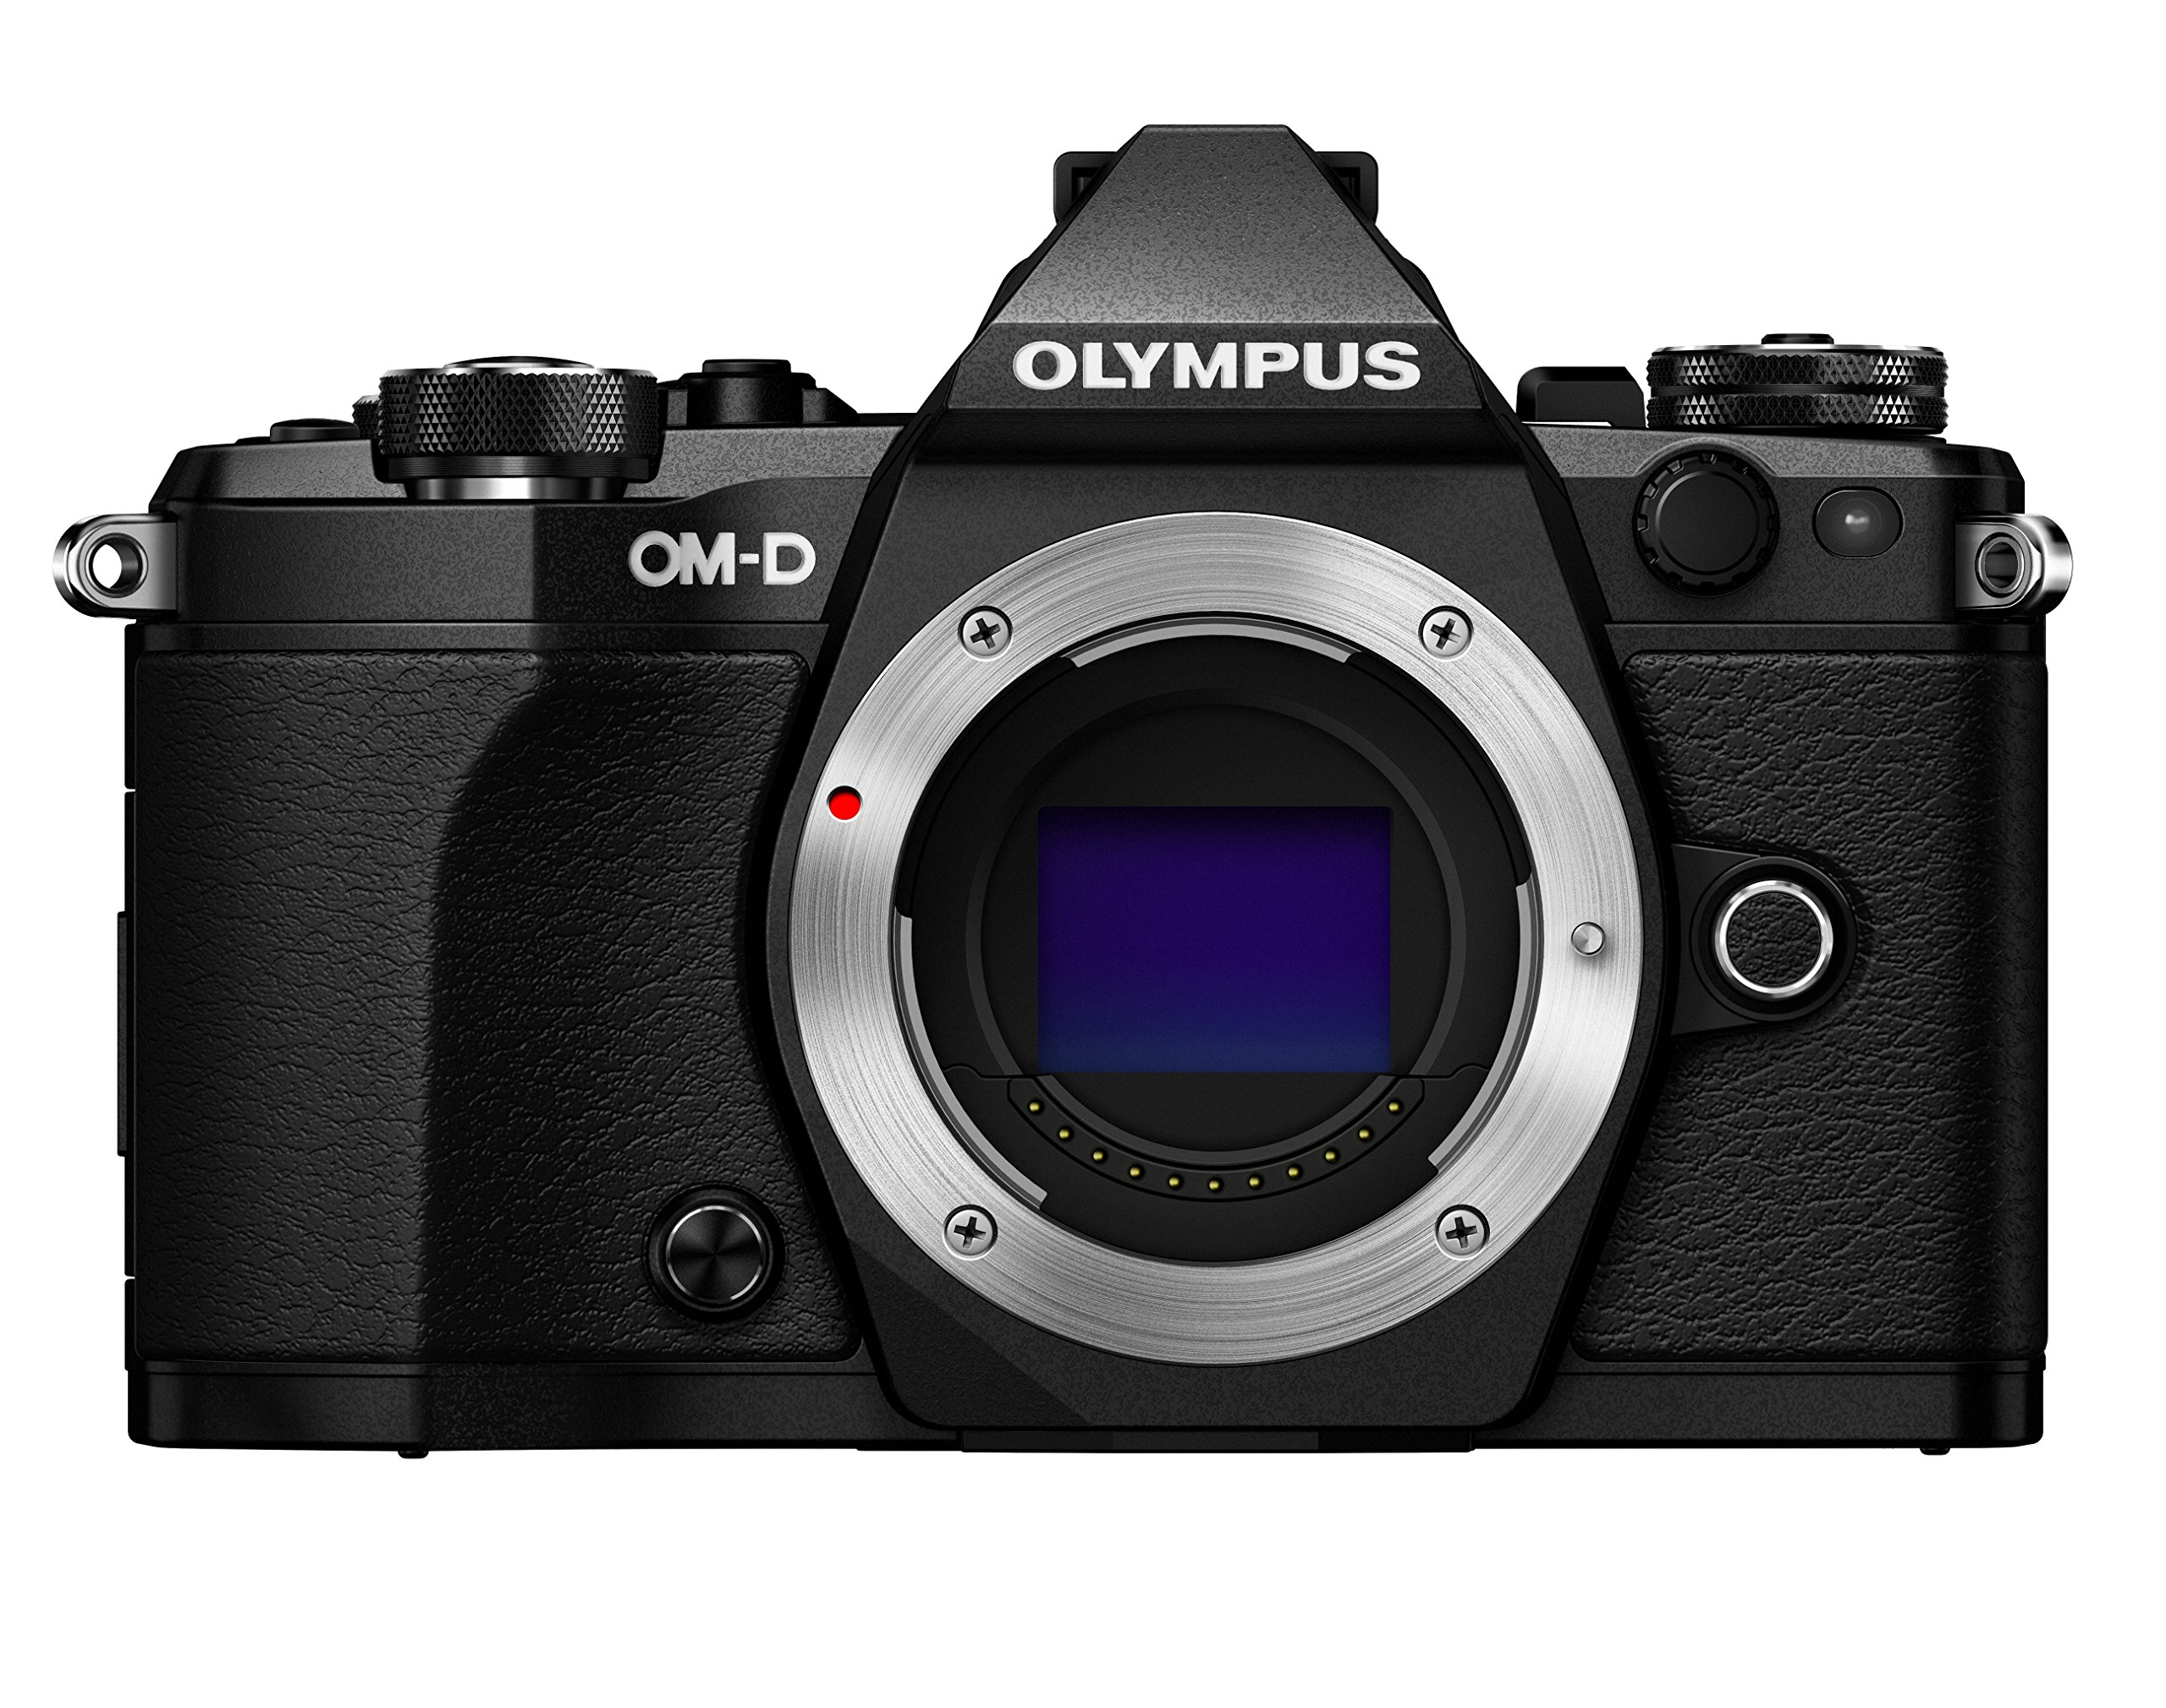 Olympus OM-D E-M5 Mark II Mirrorless Camera (Body Only), Black by Olympus